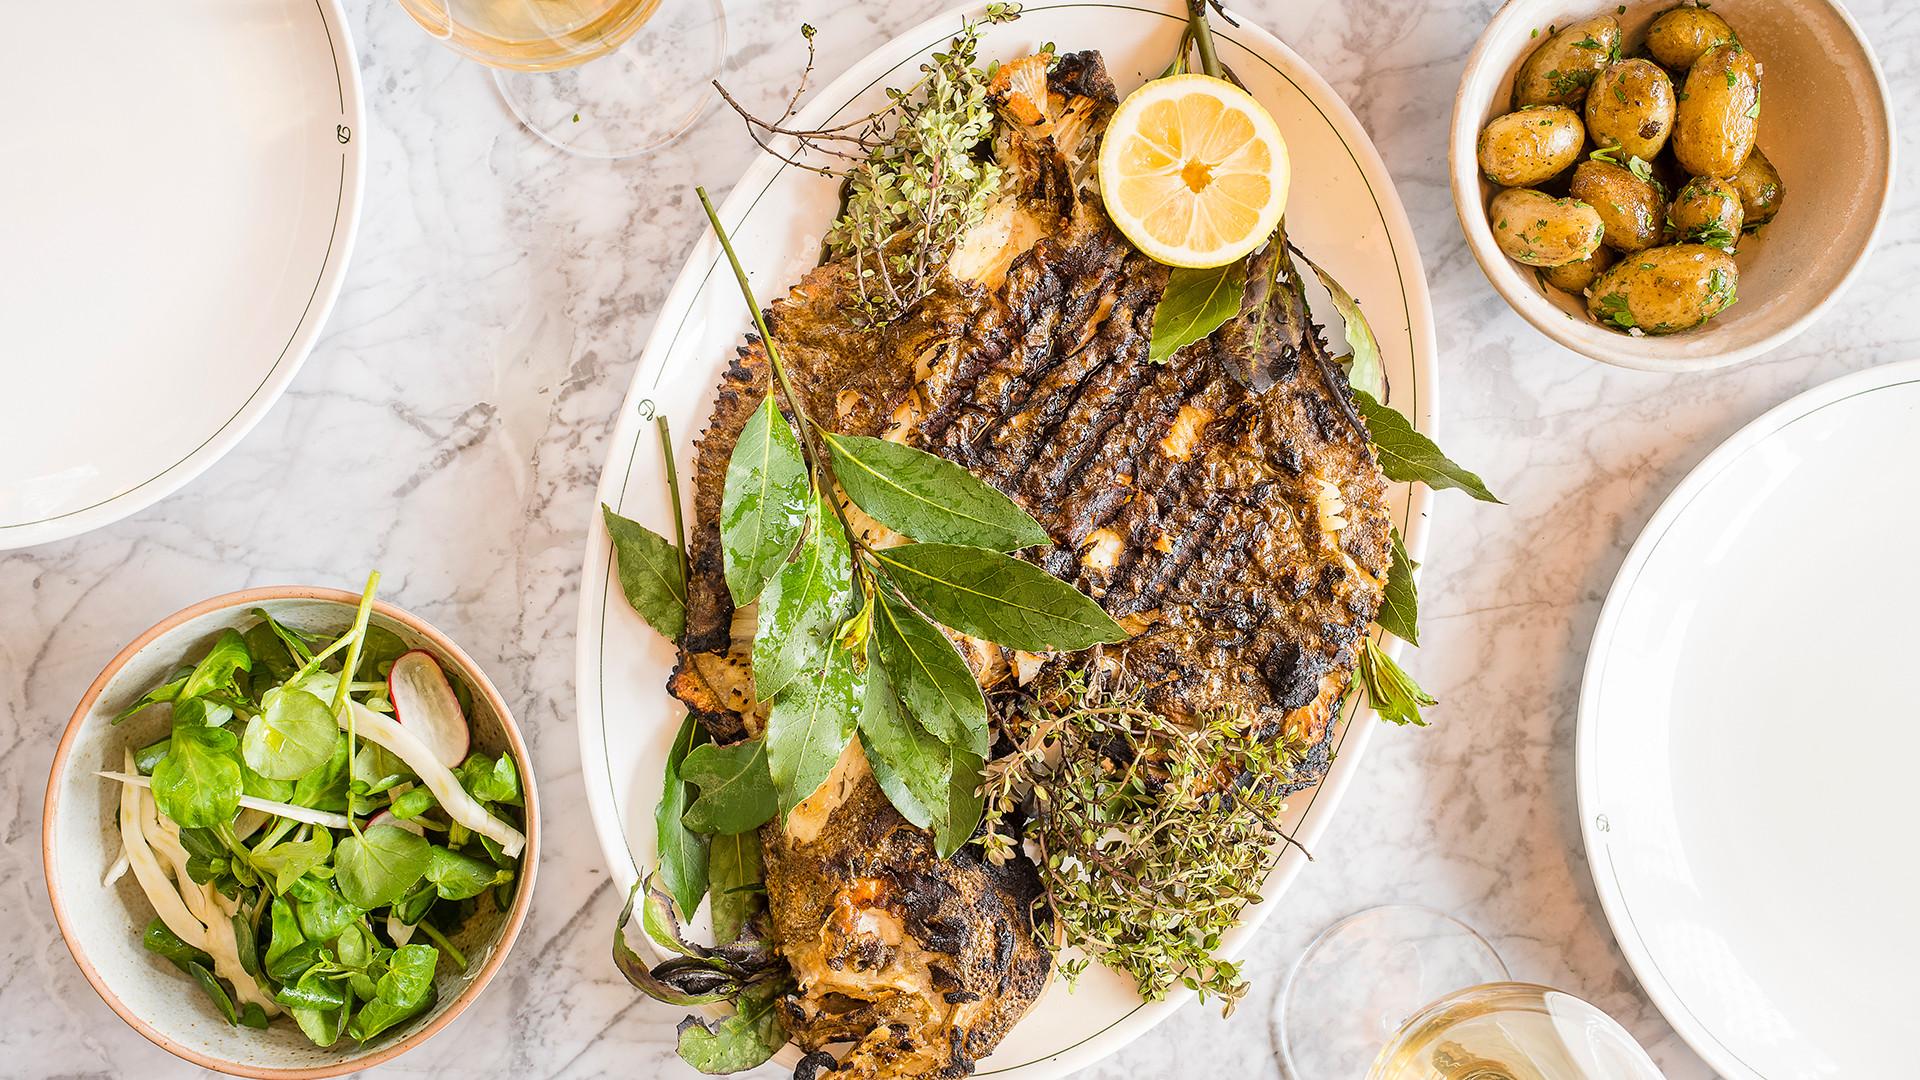 London's best seafood restaurants – Darby's